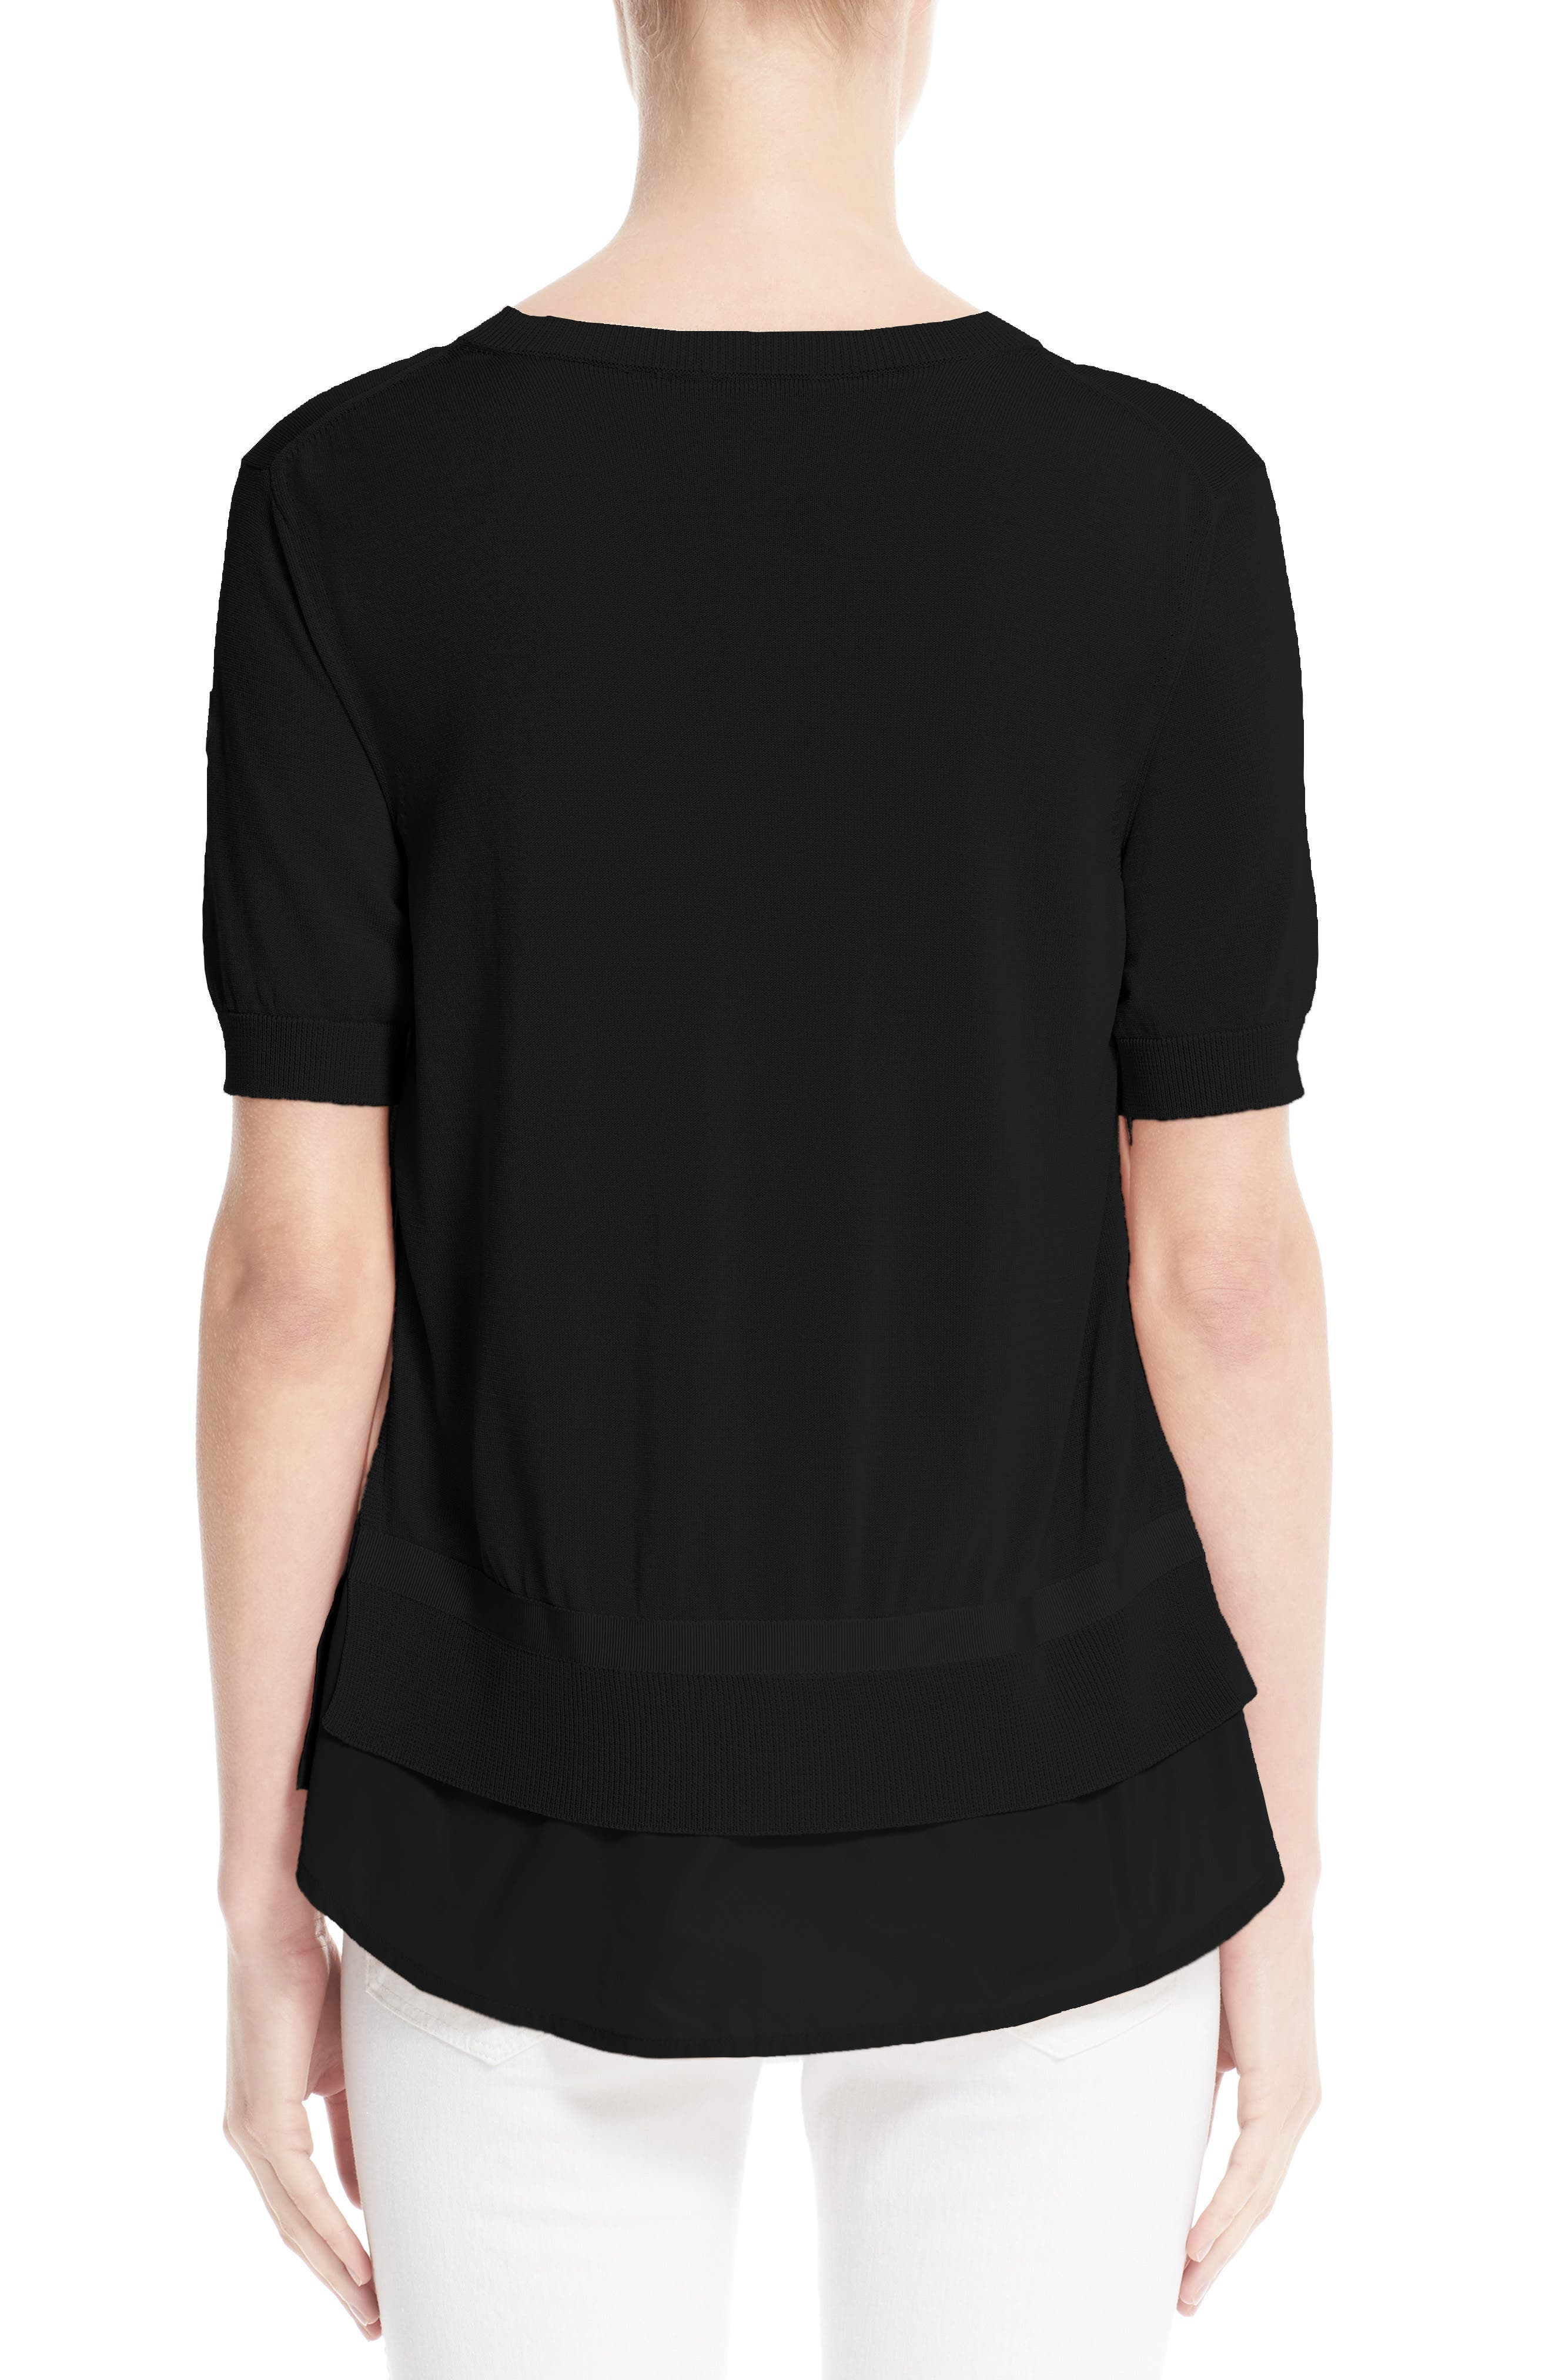 Tricot Knit Top,                             Alternate thumbnail 2, color,                             BLACK